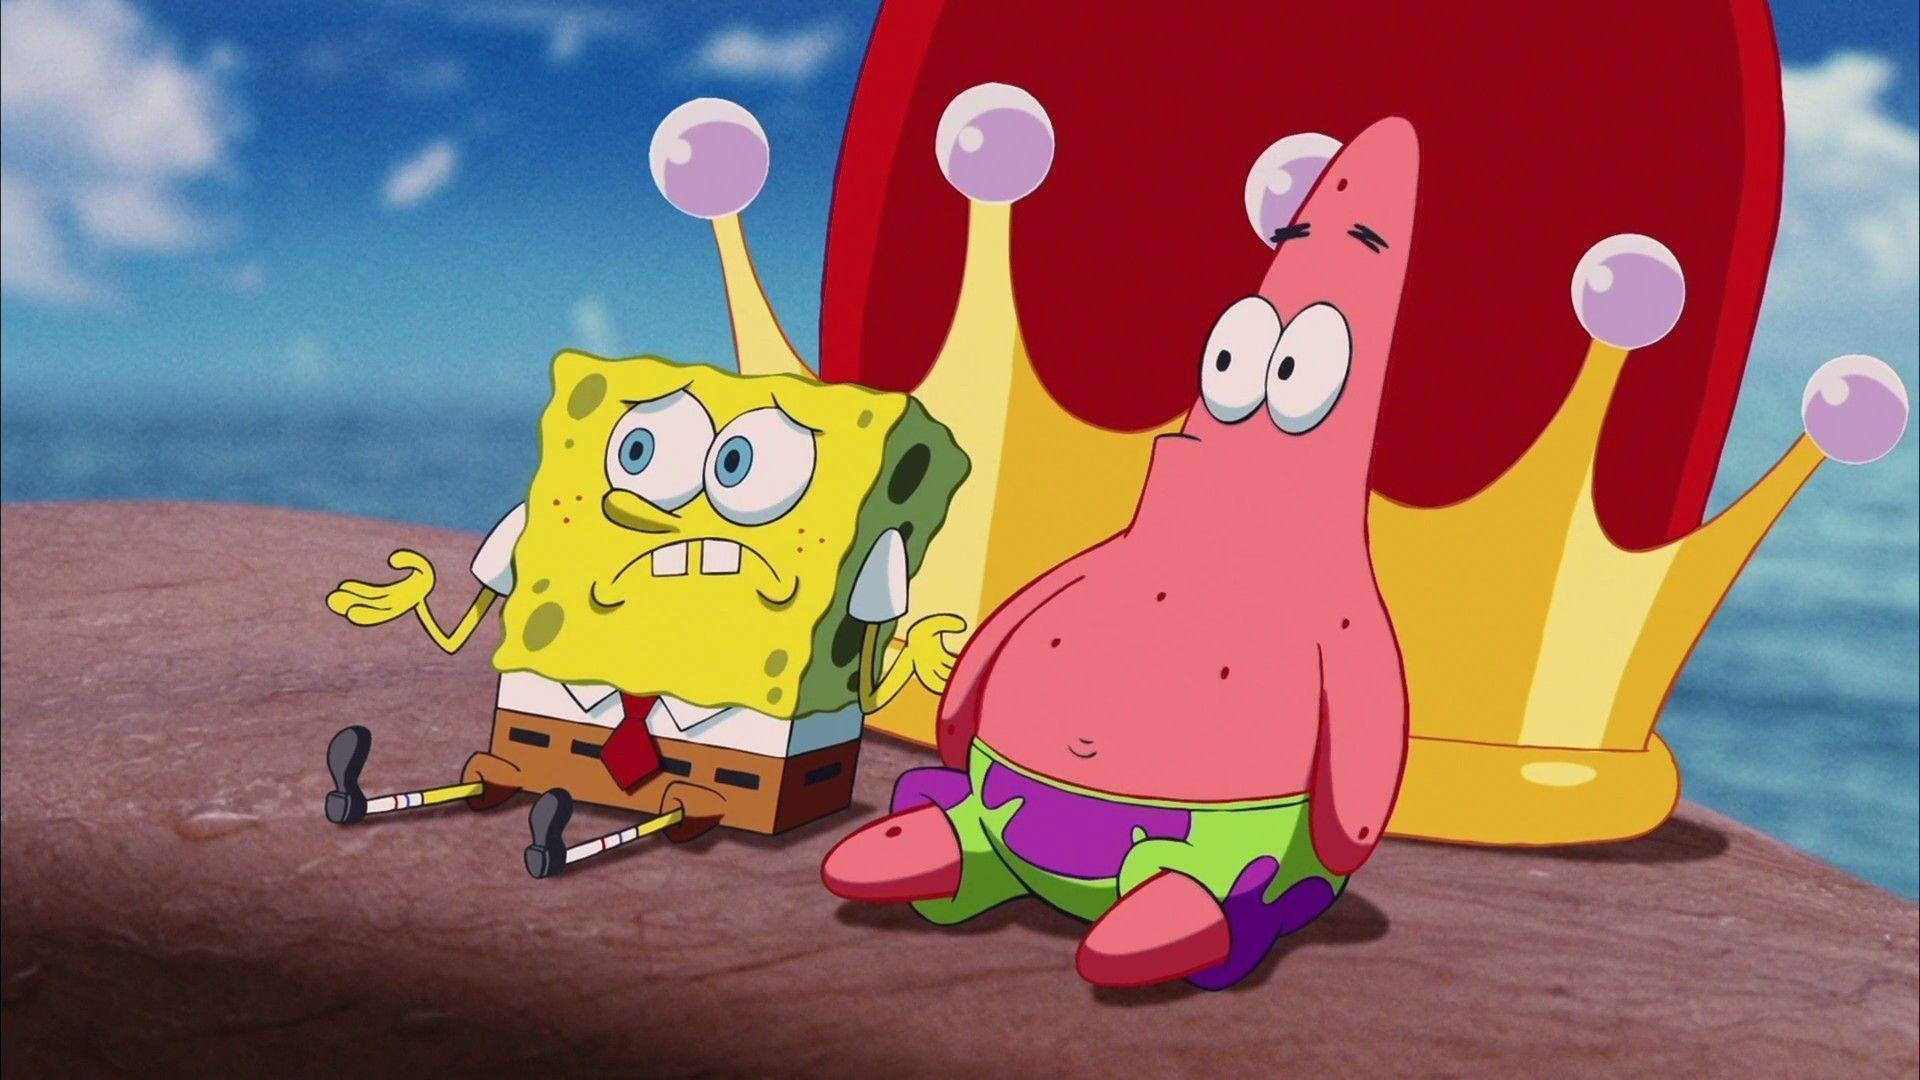 Funny Spongebob and Patrick Wallpaper | hdwallpapers-